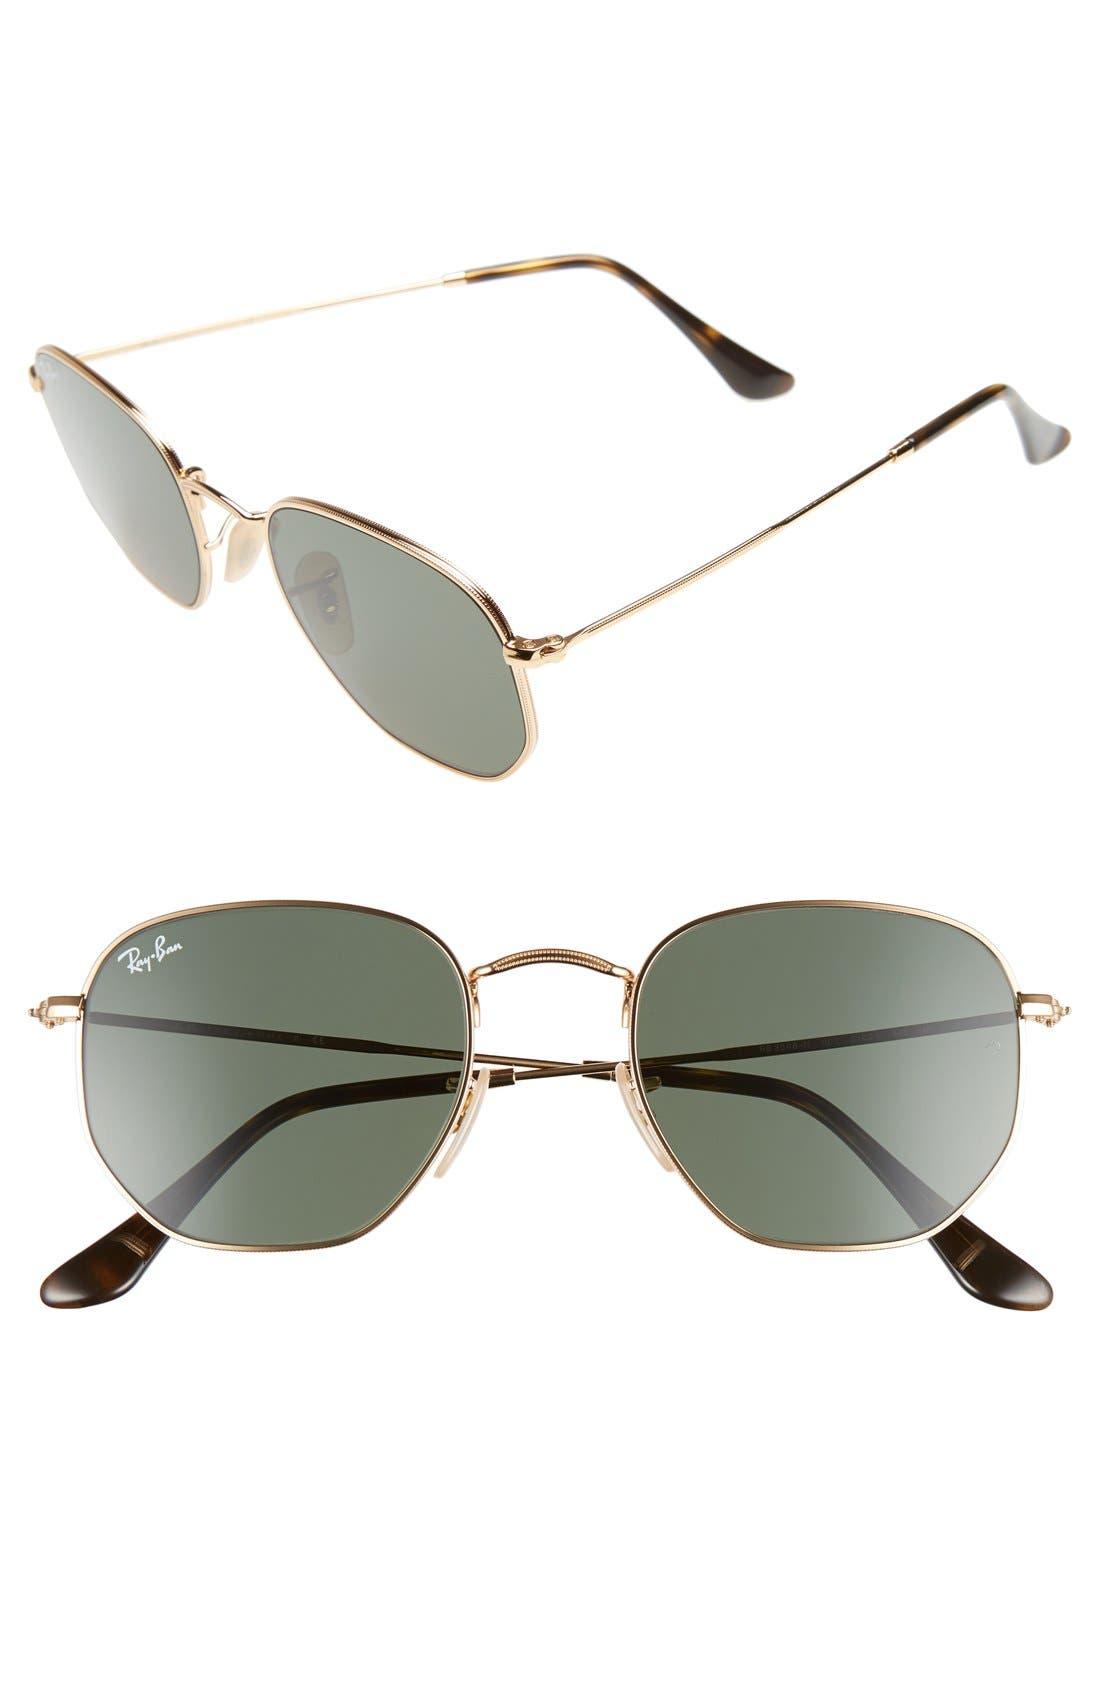 Ray-Ban 51Mm Hexagonal Flat Lens Sunglasses -